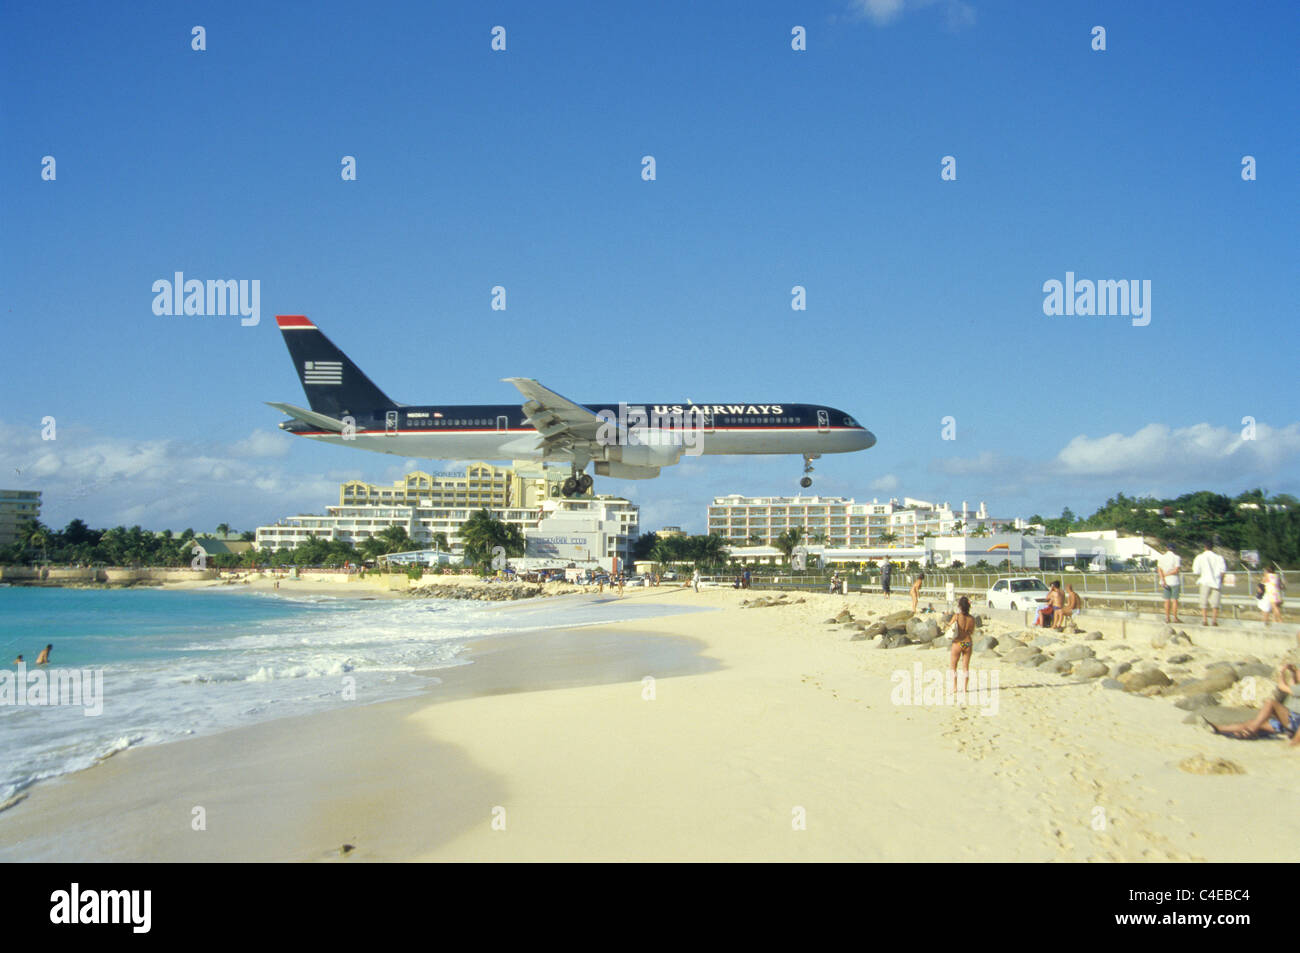 U.S. Airways airplane landing, flying close over Maho Beach, St. Martin, St. Maarten, Saint Marten, Carribean - Stock Image